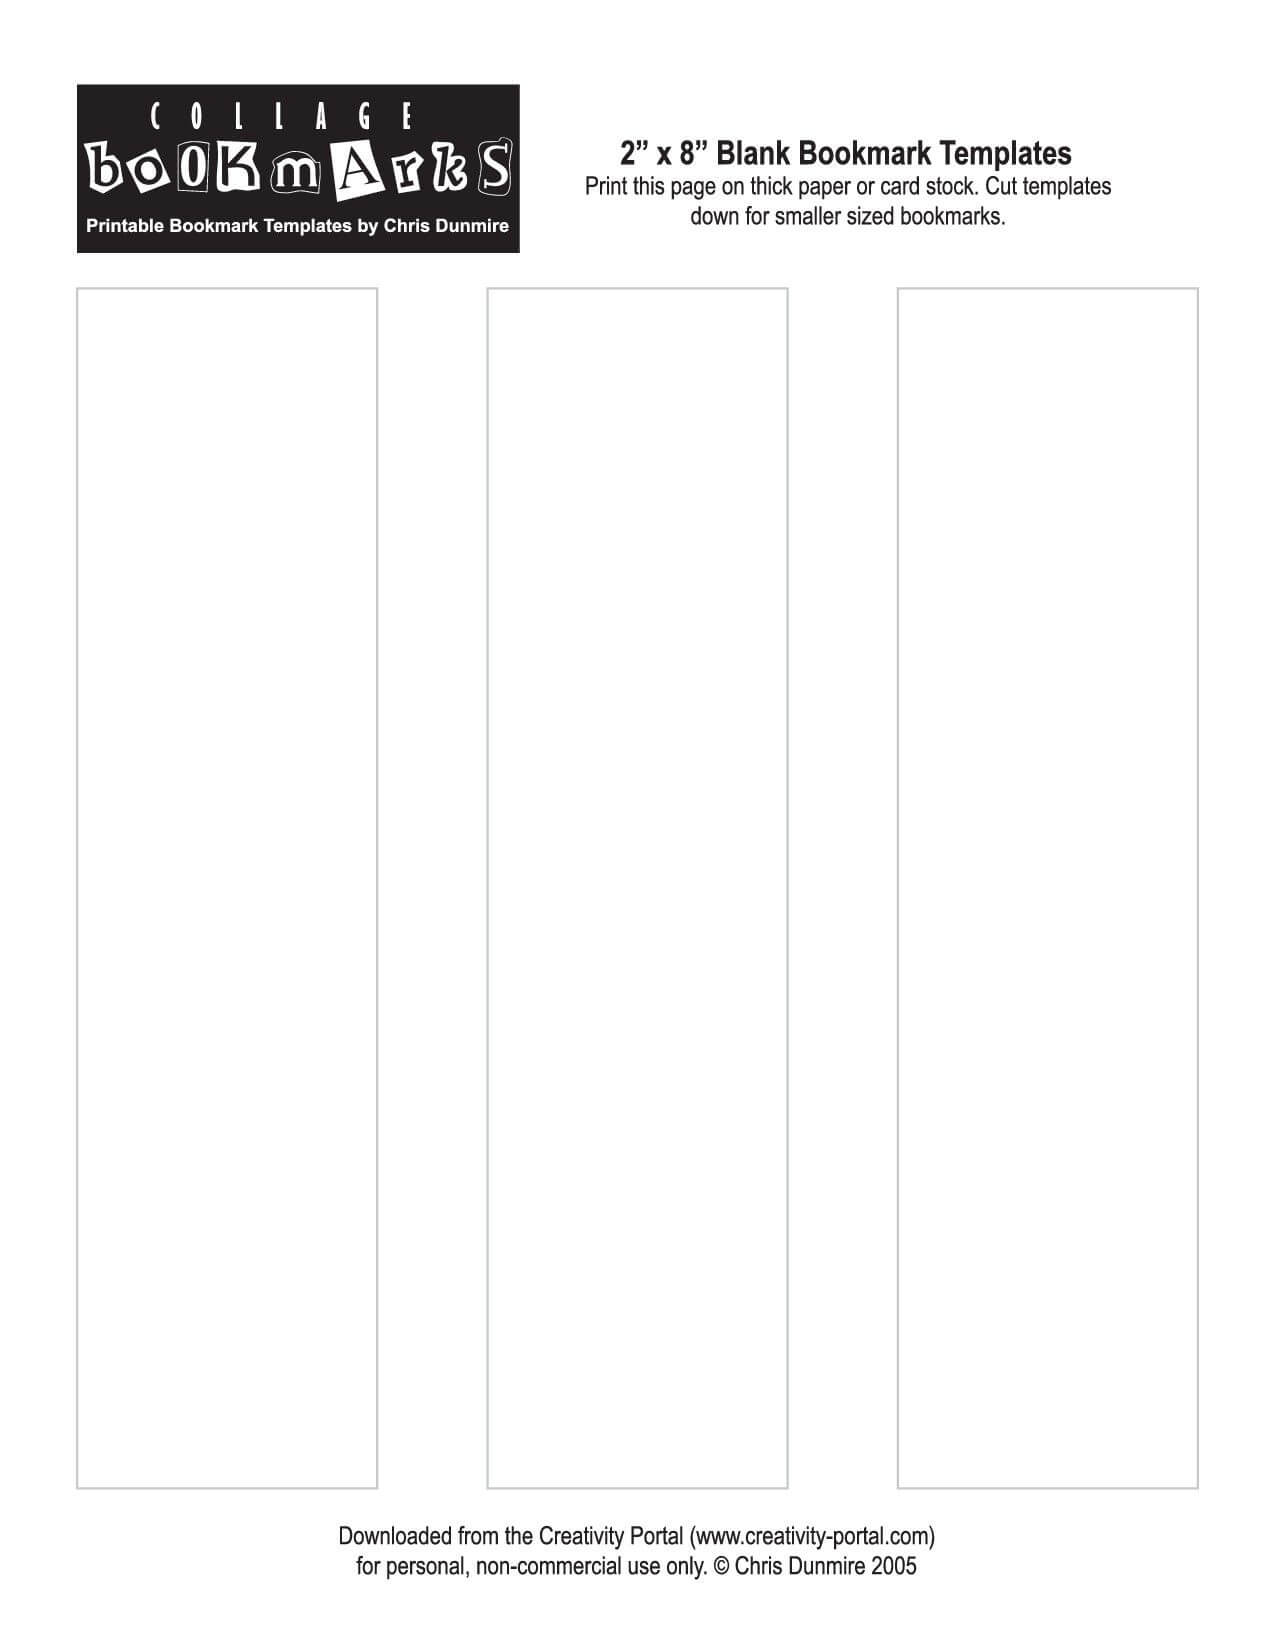 Blank Bookmark Template Printable | Literacy | Bookmark with regard to Free Blank Bookmark Templates To Print